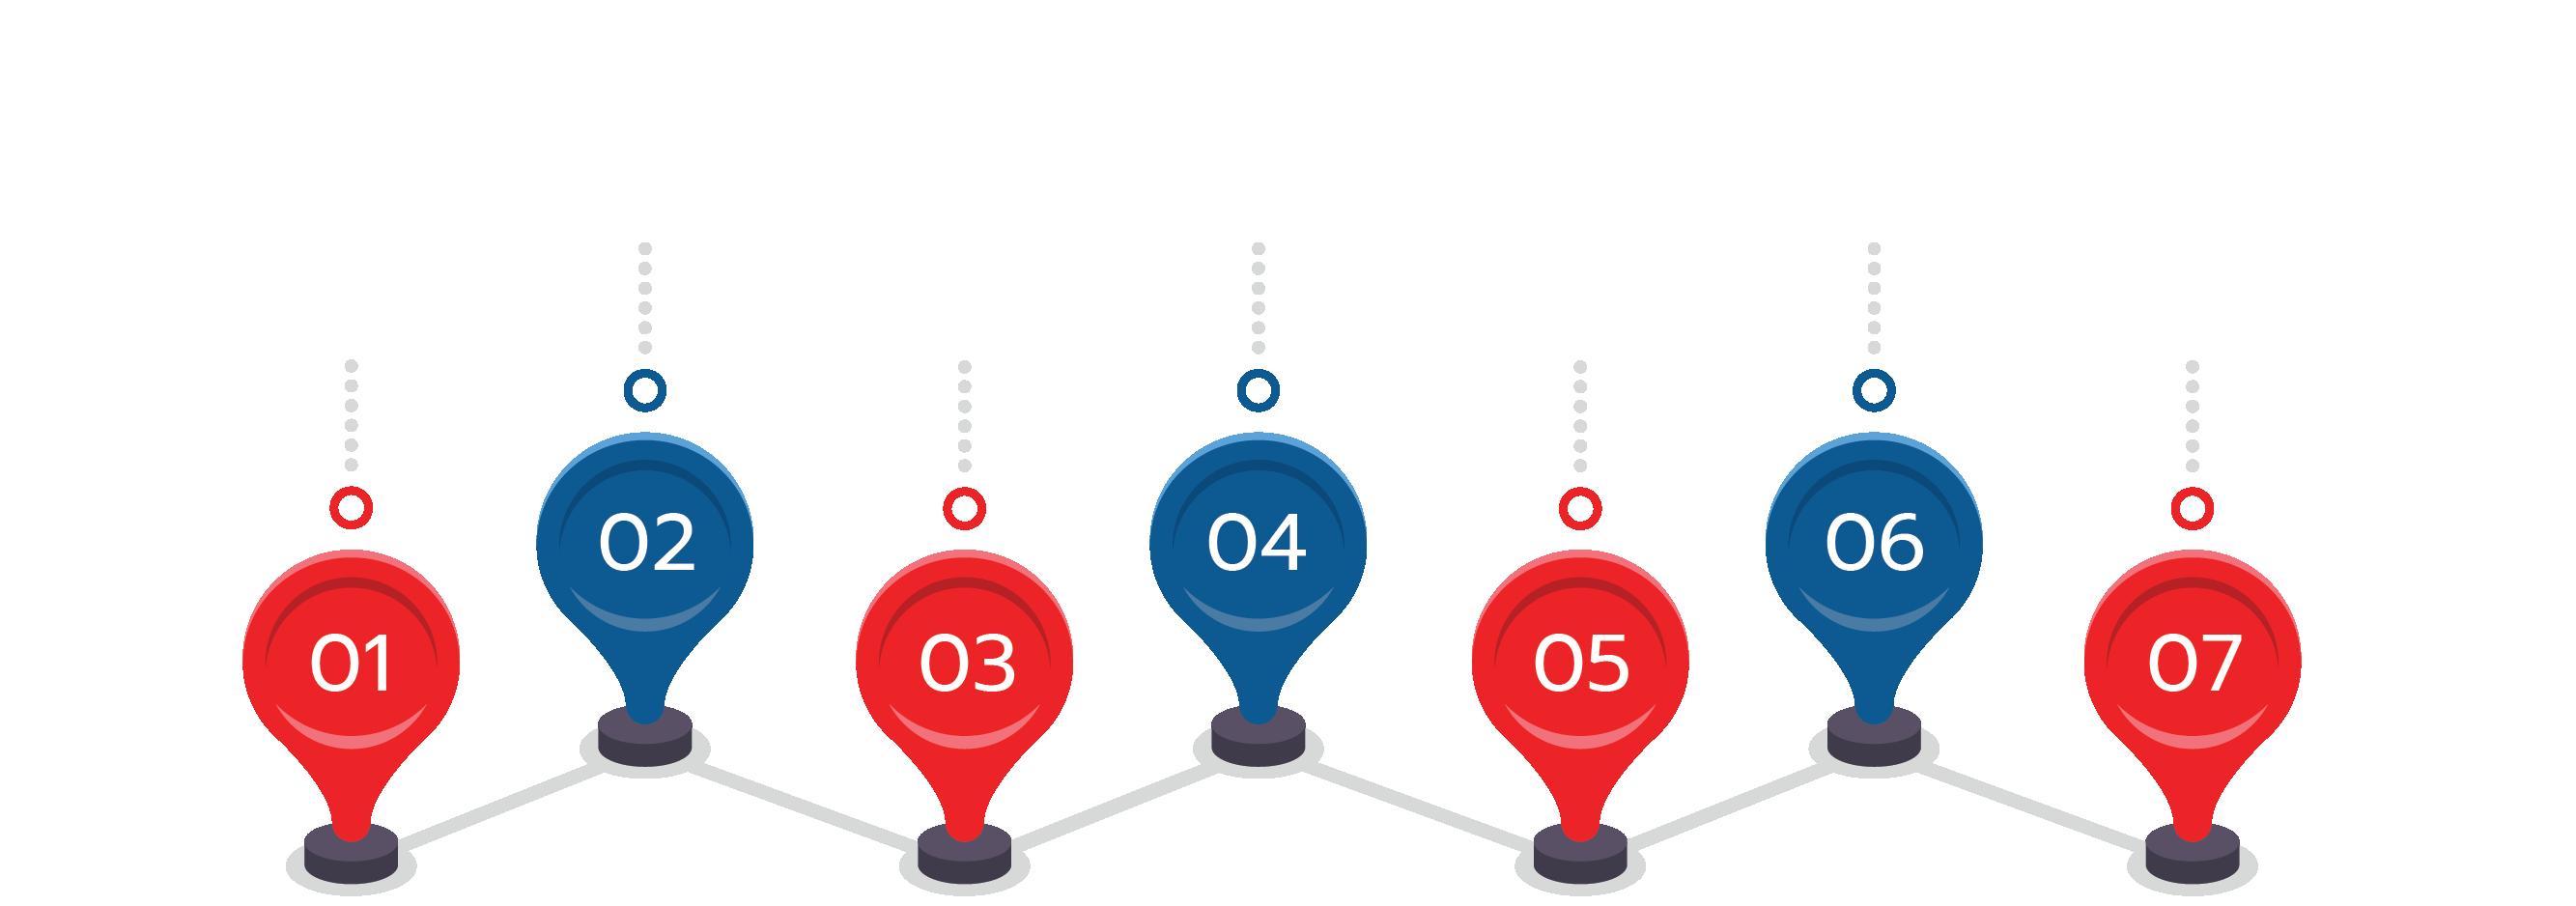 image - service 7 type